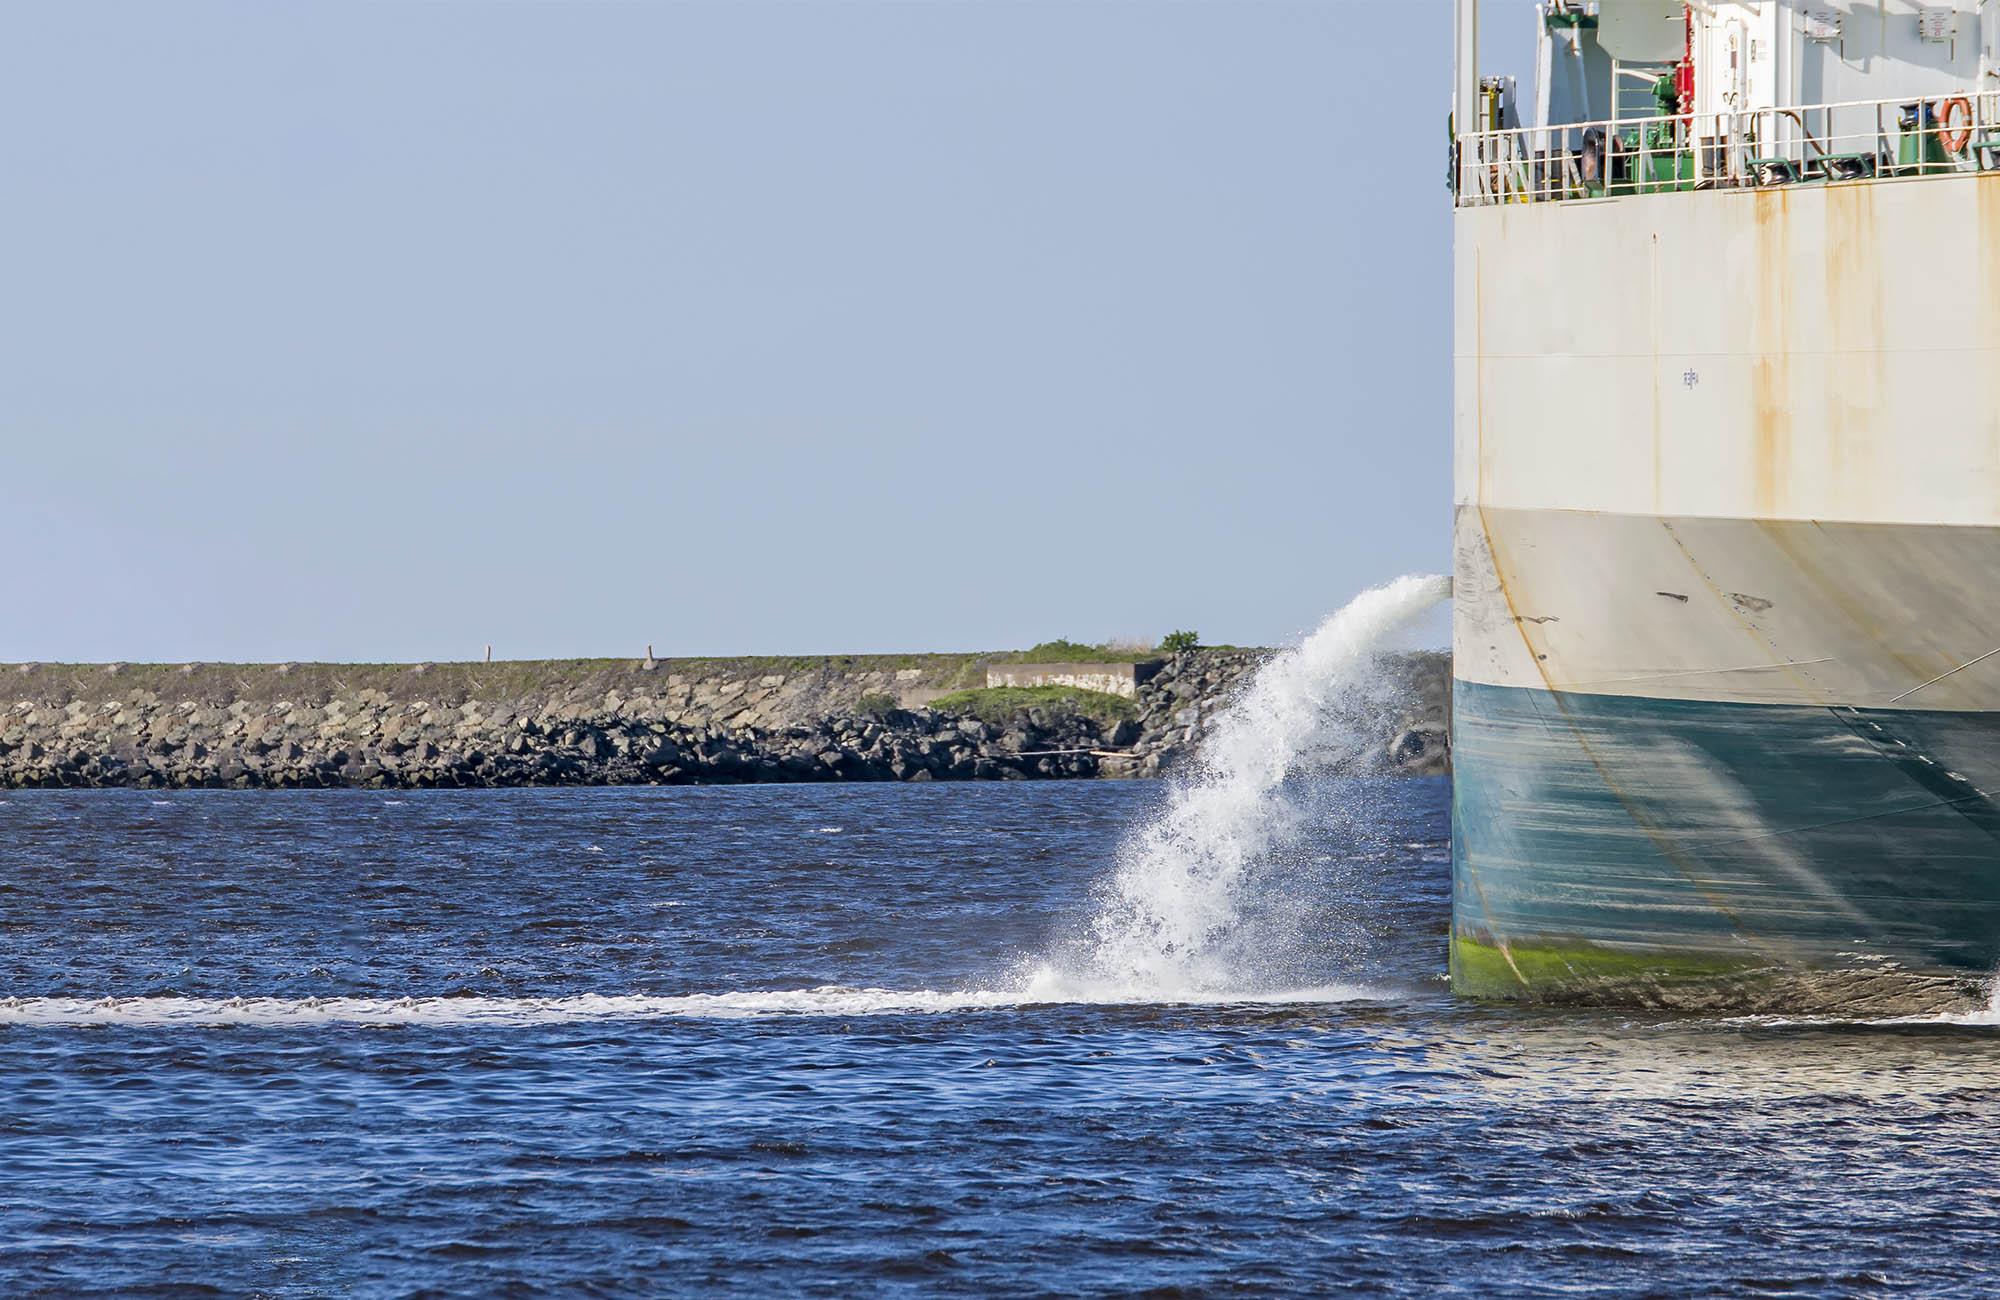 Ballast Water Regulation